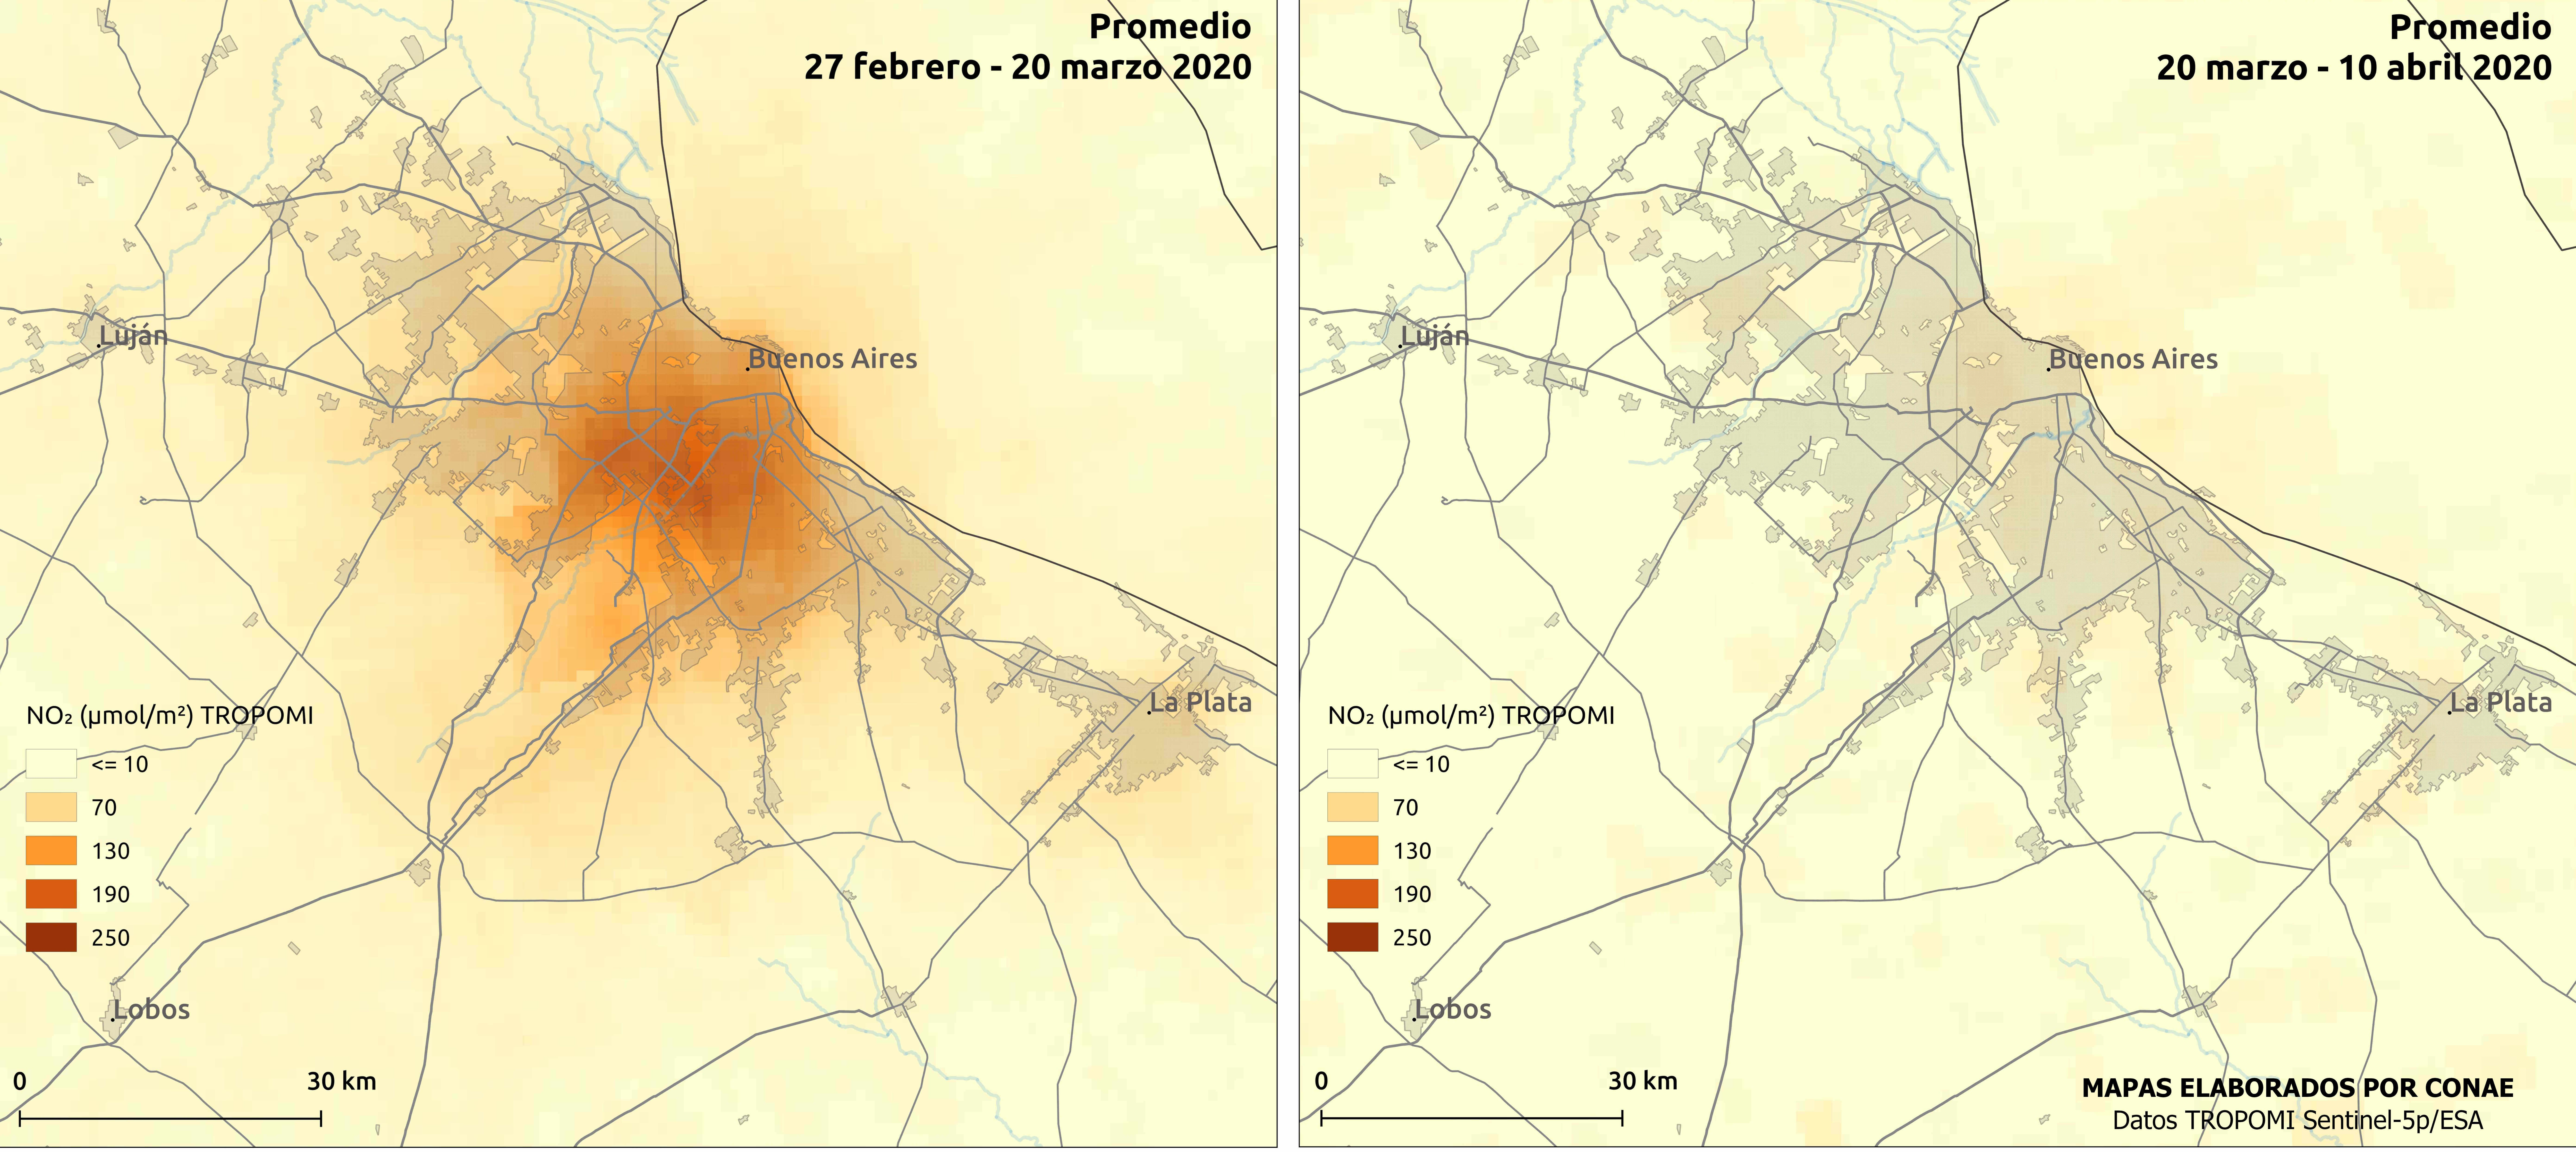 Mapa comparativo Buenos Aires